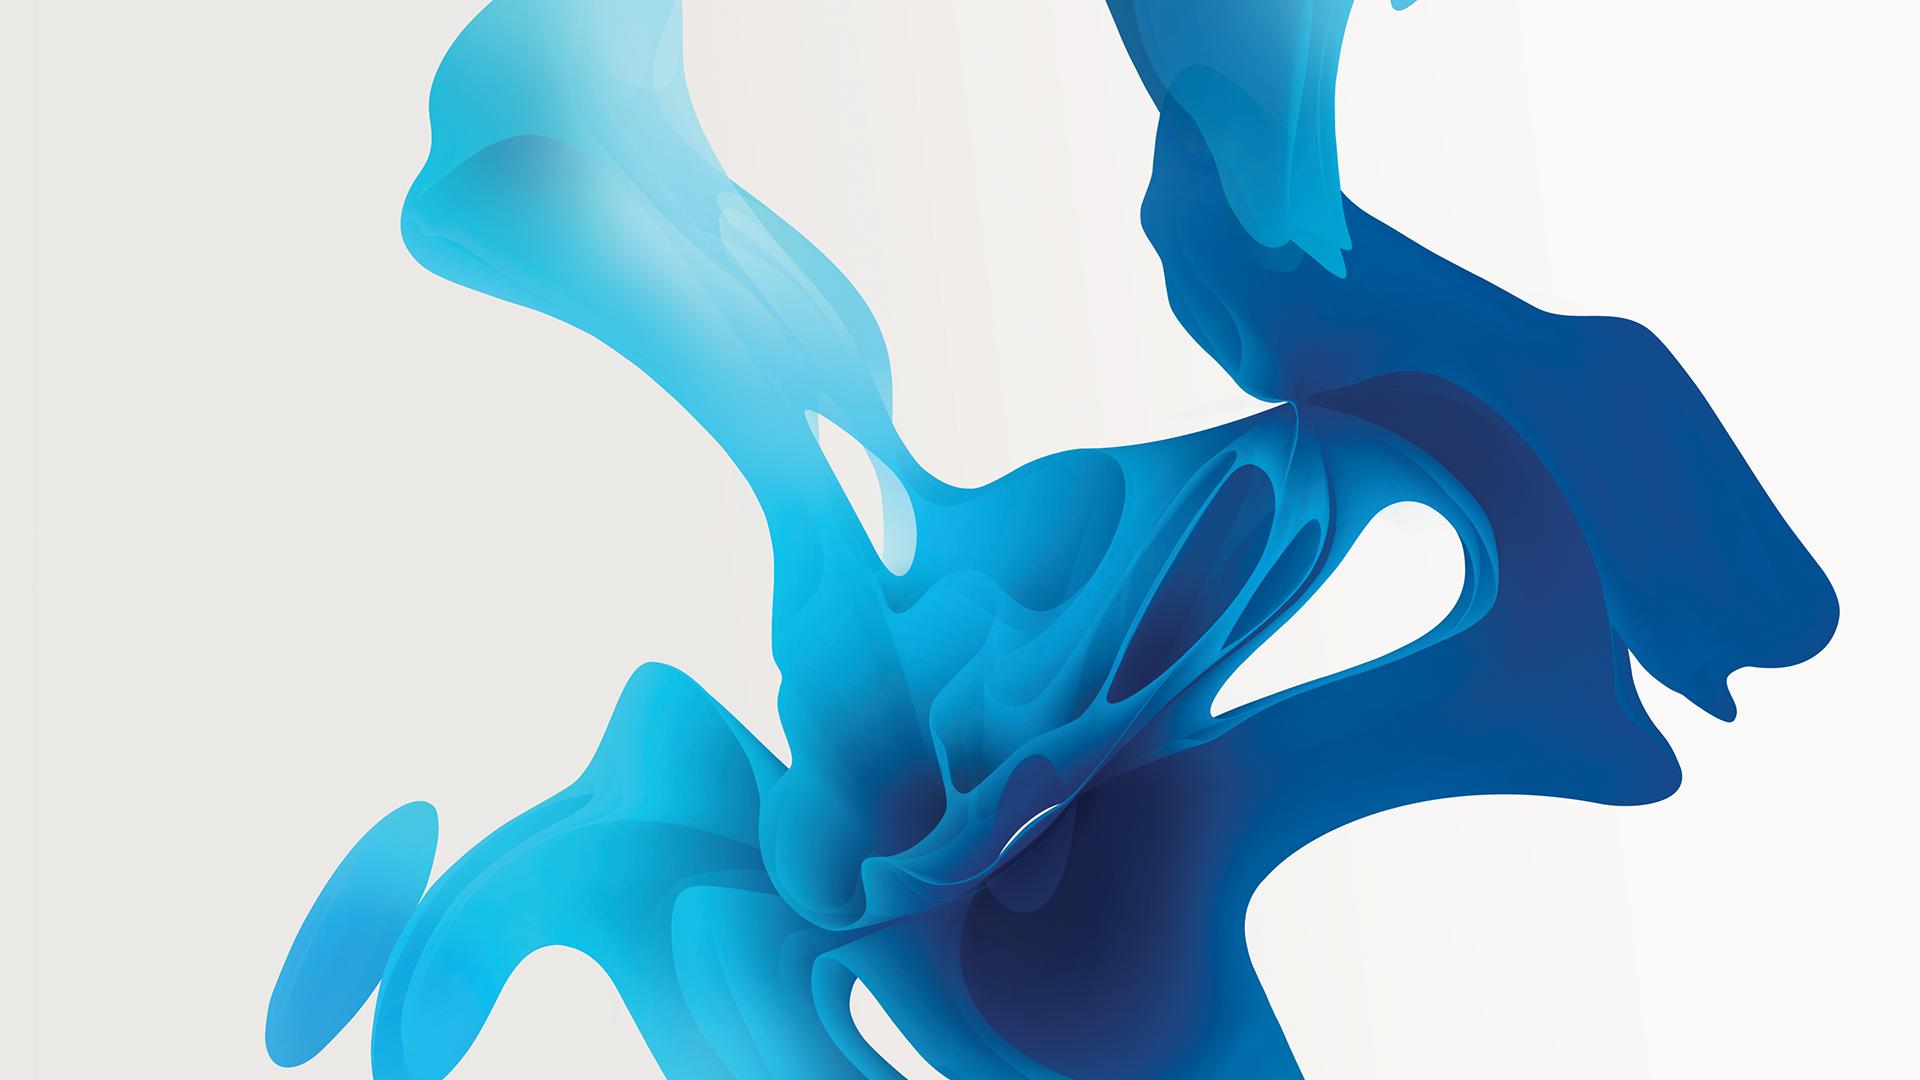 Elegant Waves of Light by Maria Grønlund